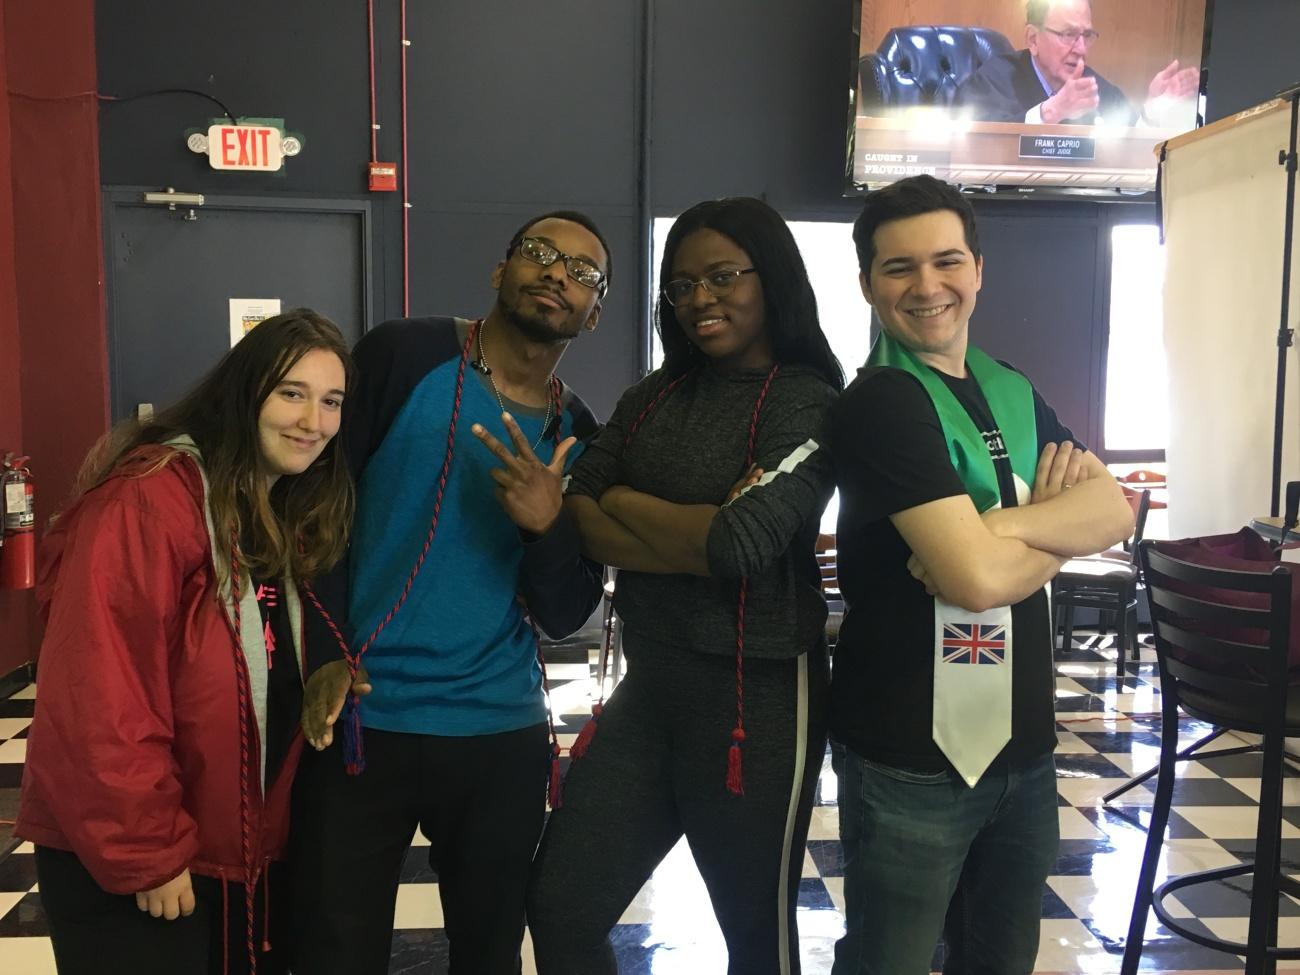 L Carly Edelman, Moufatih Muhammad, Lauren Barrett, R Ryan Modica.JPG